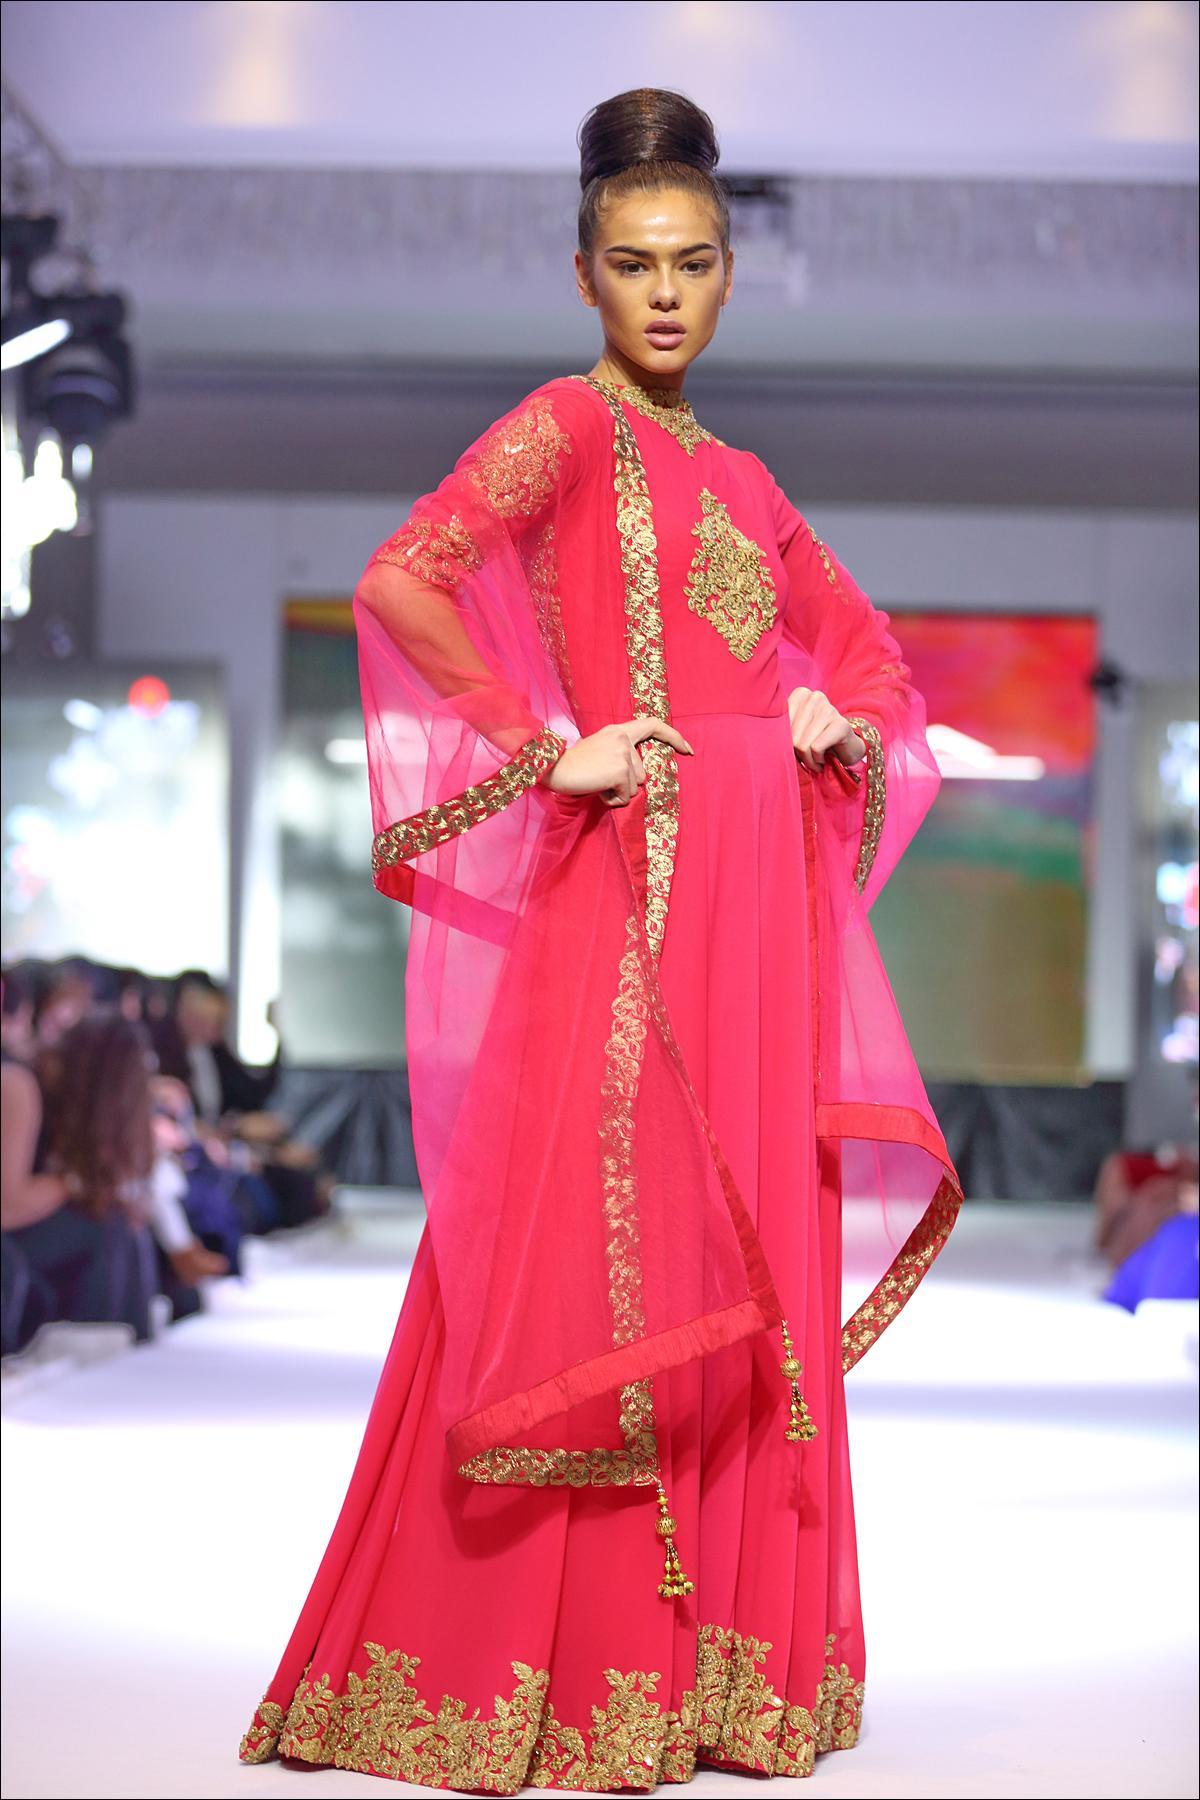 Dubai Fashion Week Ss11 El Deseo Sketchbook Magazine